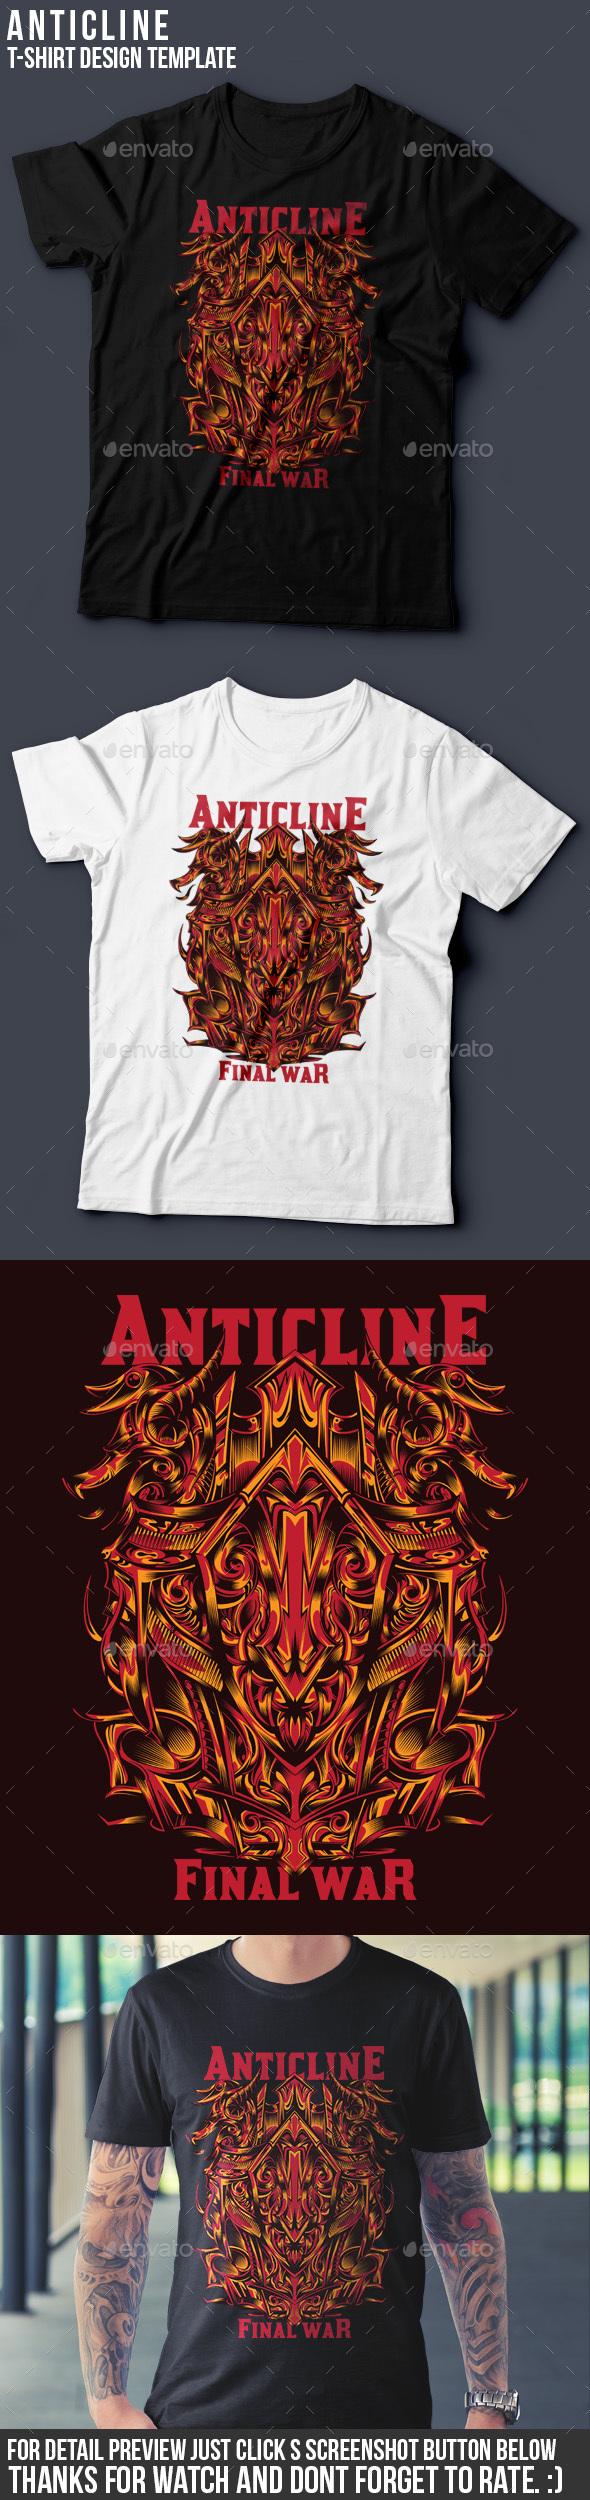 Anticline T-Shirt Design Template - Grunge Designs